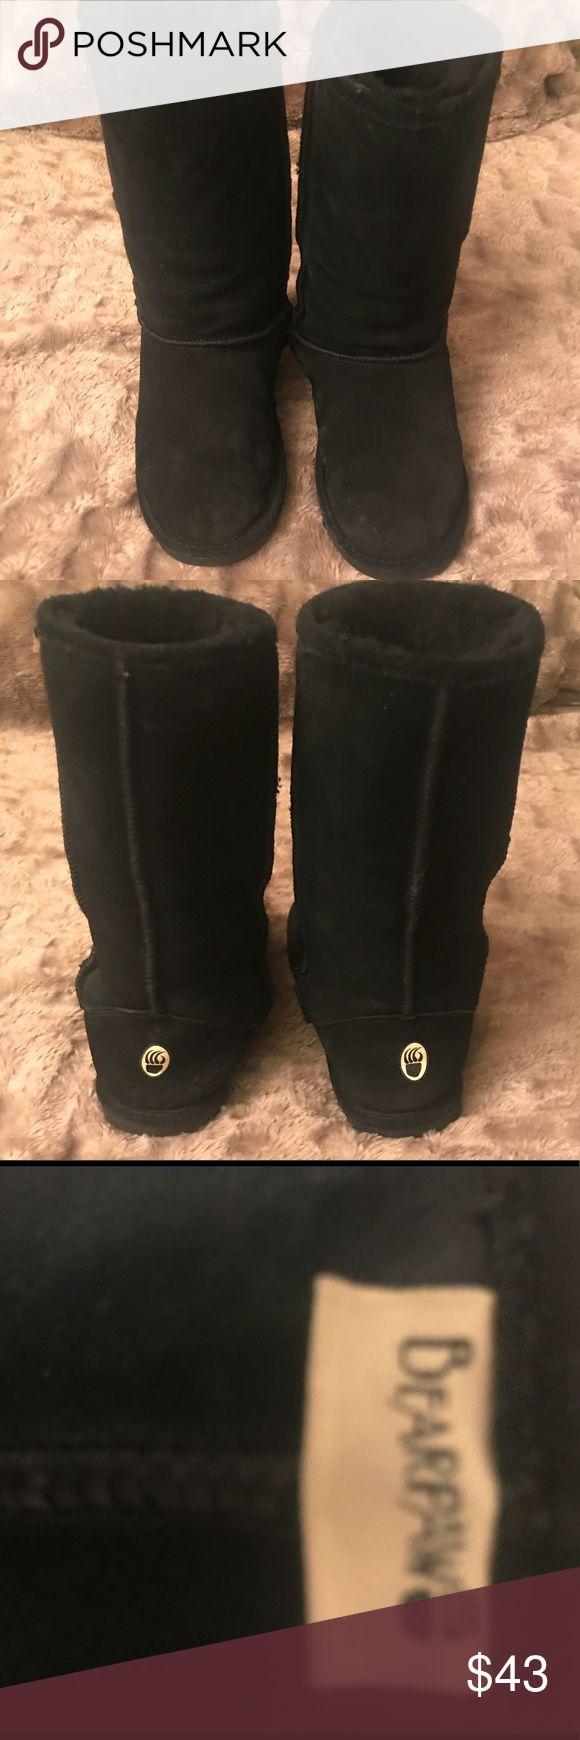 BEARPAW Black Mid-calf Boots Sz7W LIke New! ❤️❤️❤️ BEARPAW Black Mid-calf Boots w/ Wool inside Sz 7W LIke New!  ❤️❤️❤️ BearPaw Shoes